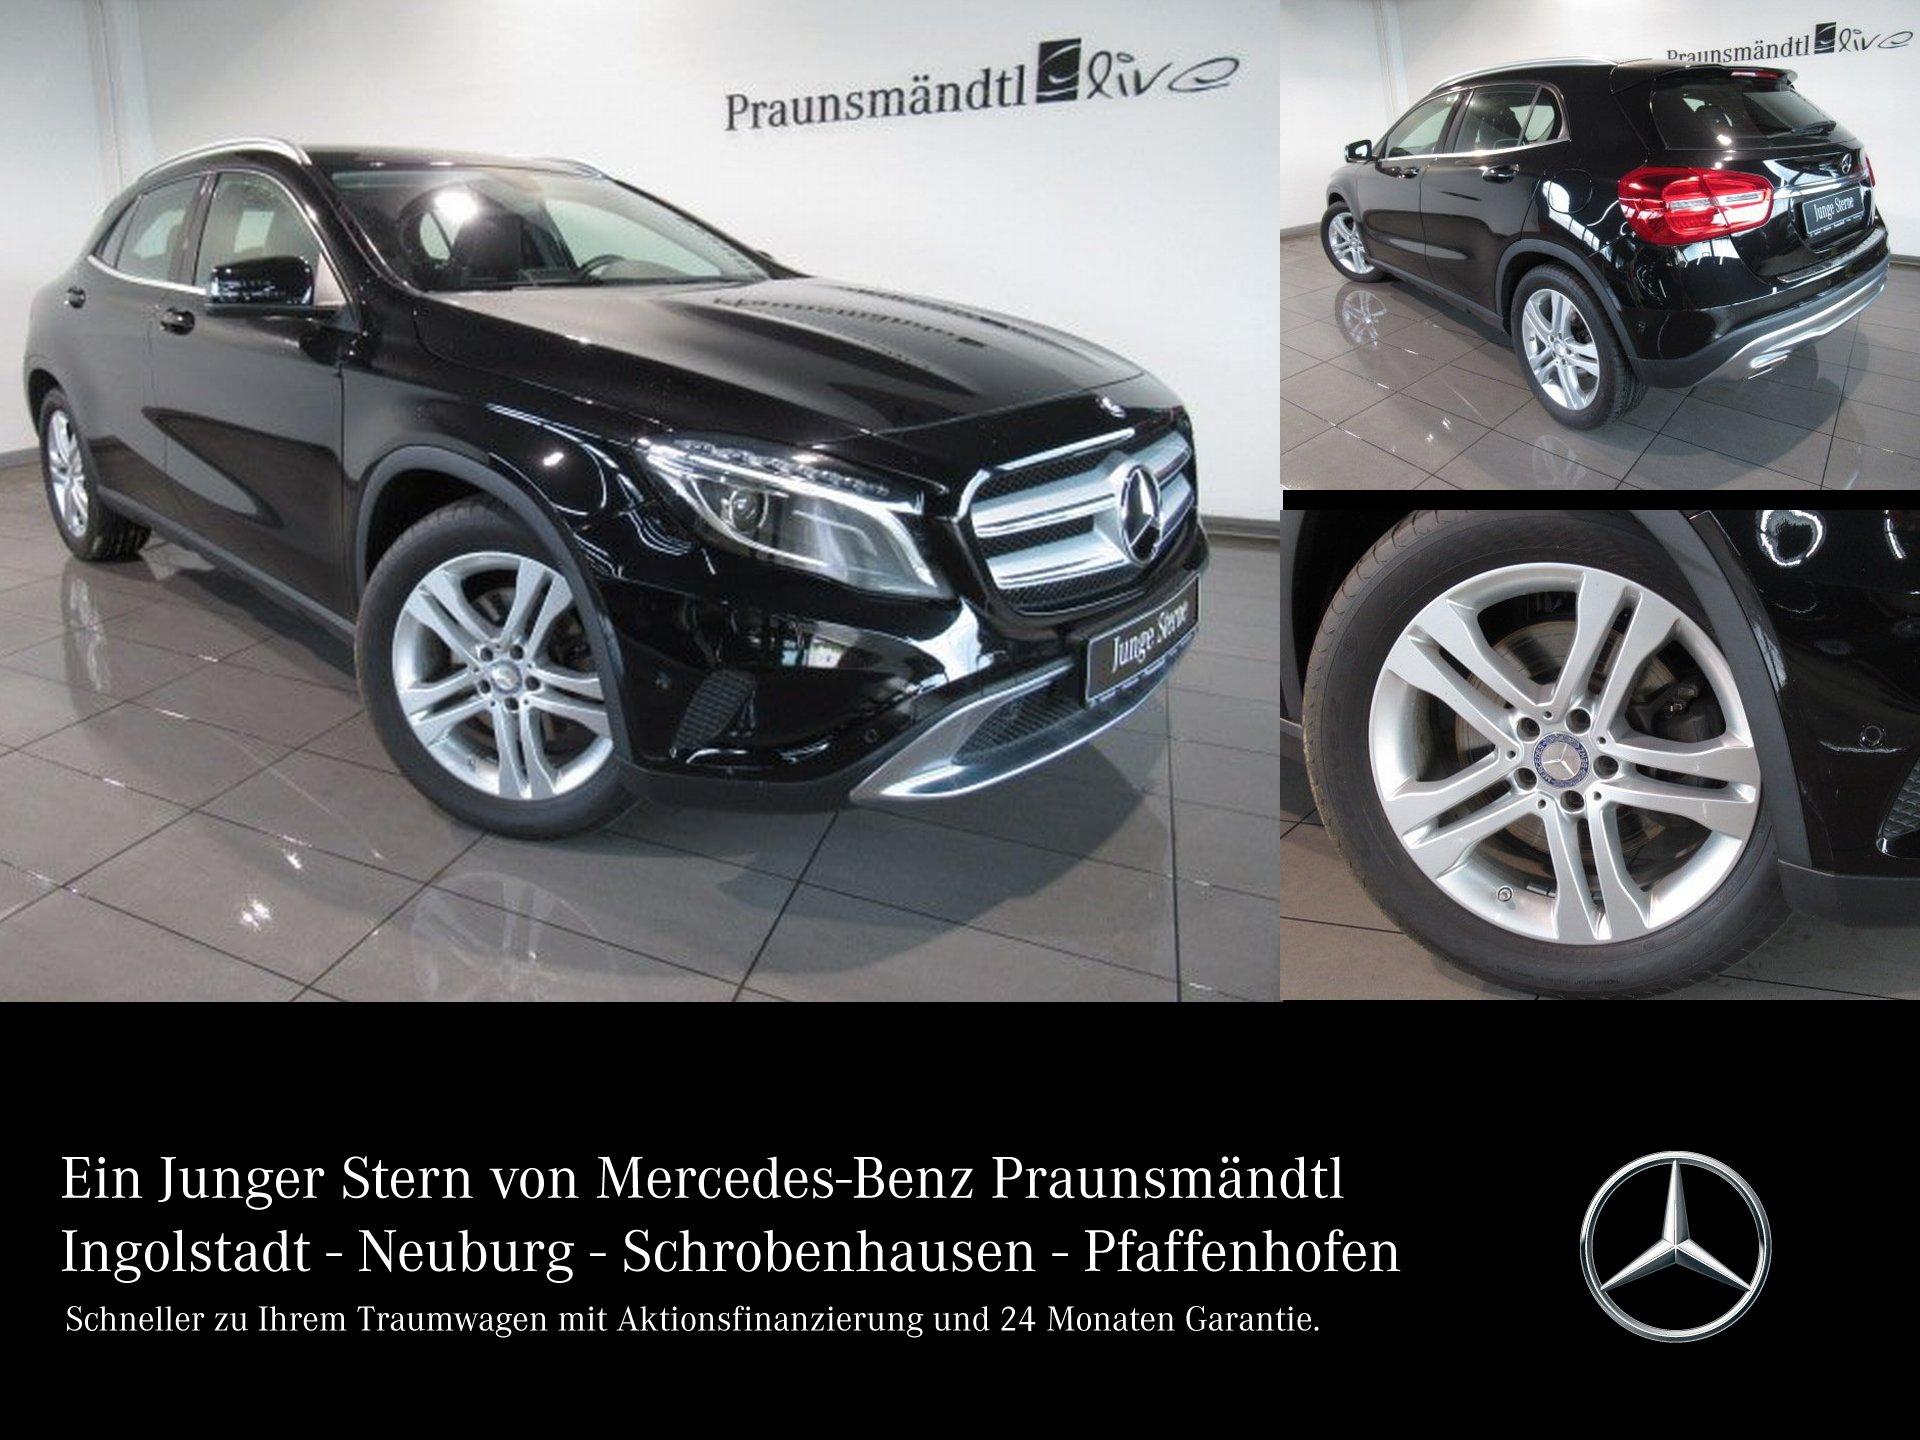 Mercedes-Benz GLA 250 4M Urban 7ATG/BiXenon/Navi/PTS/SHZ/LMR18, Jahr 2015, Benzin